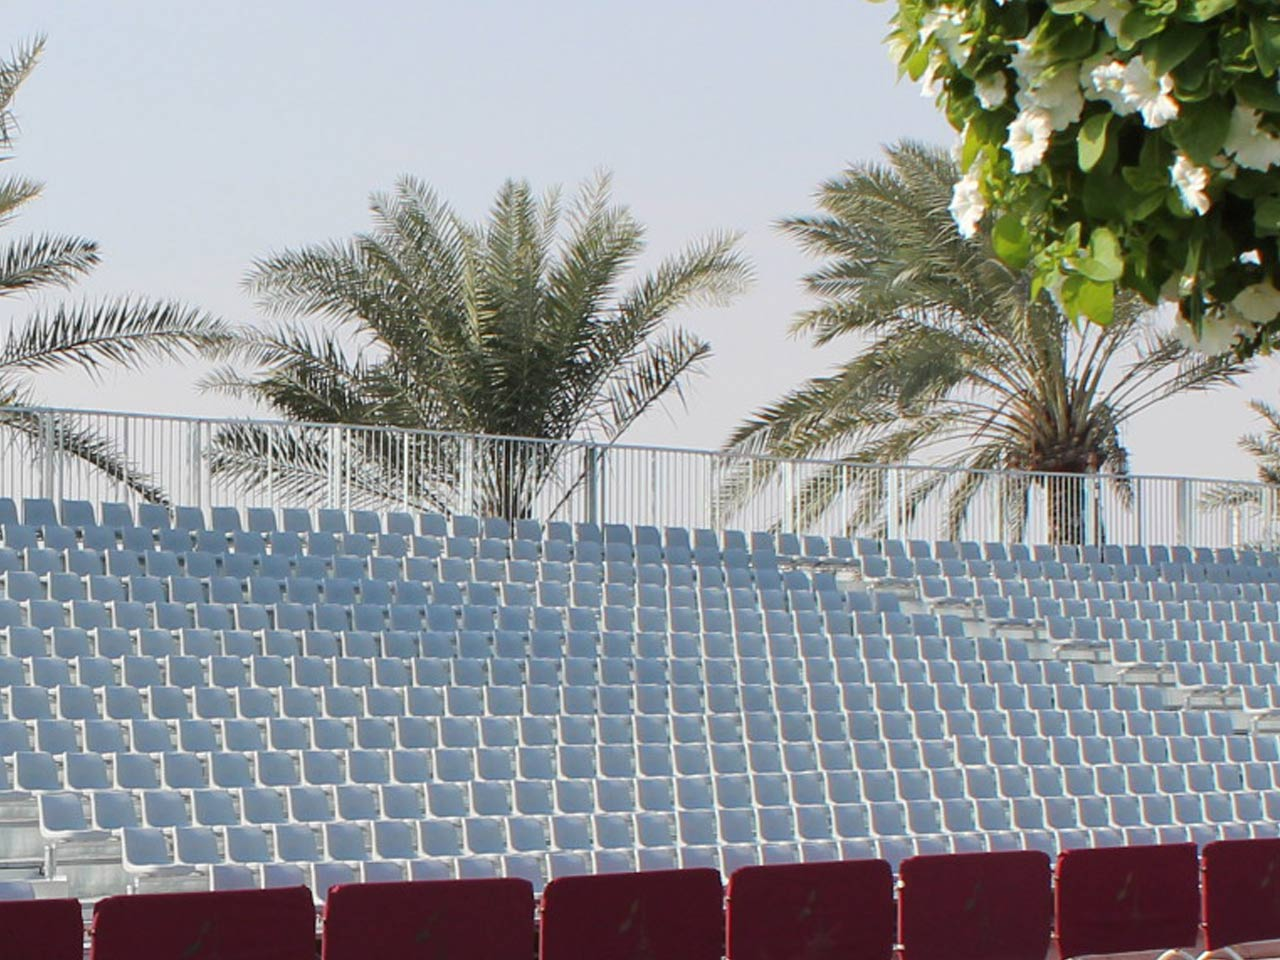 grandstand-seats-events-setup-rental-stadium-seating-sport-management-film-festival-seating-screening-f1-open-air-cinema-6